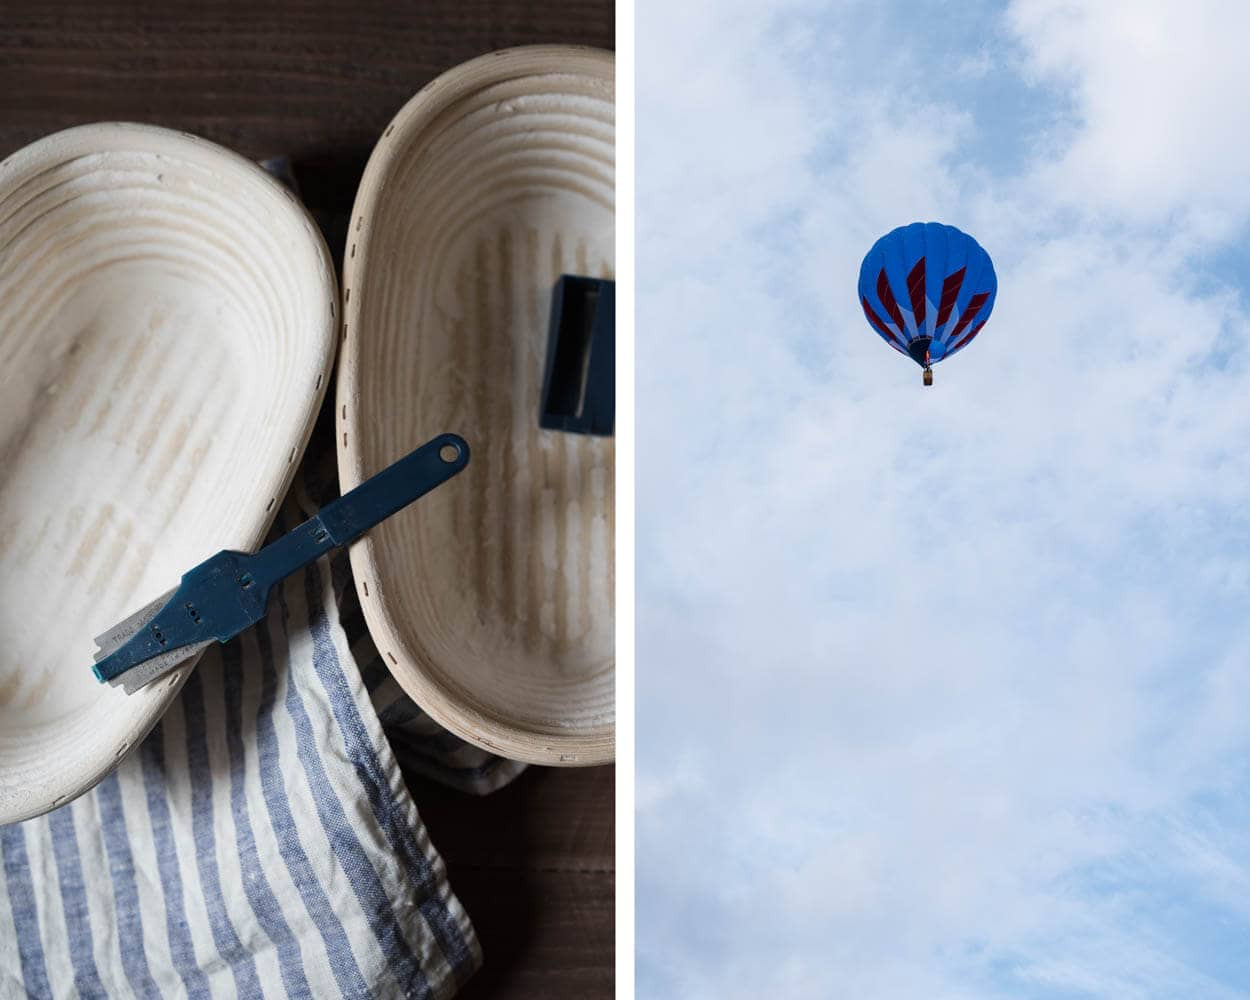 Balloon Fiesta and bannetons